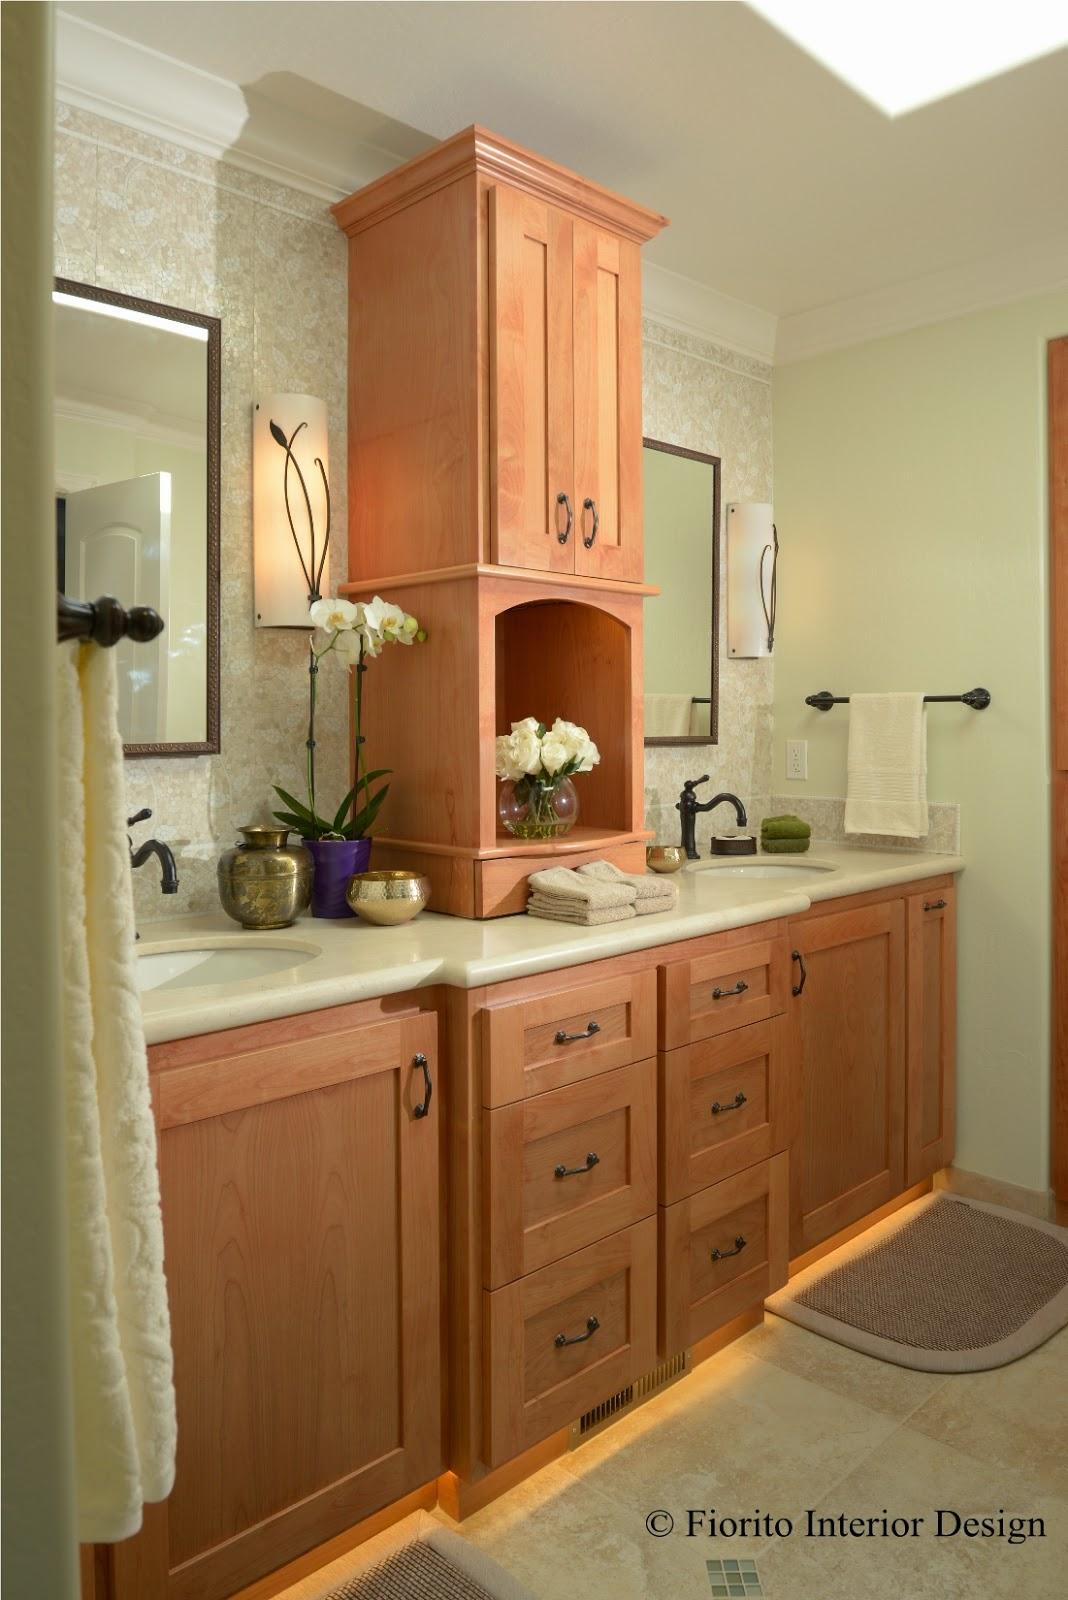 Fiorito interior design sconces your second and third for Master bath lighting